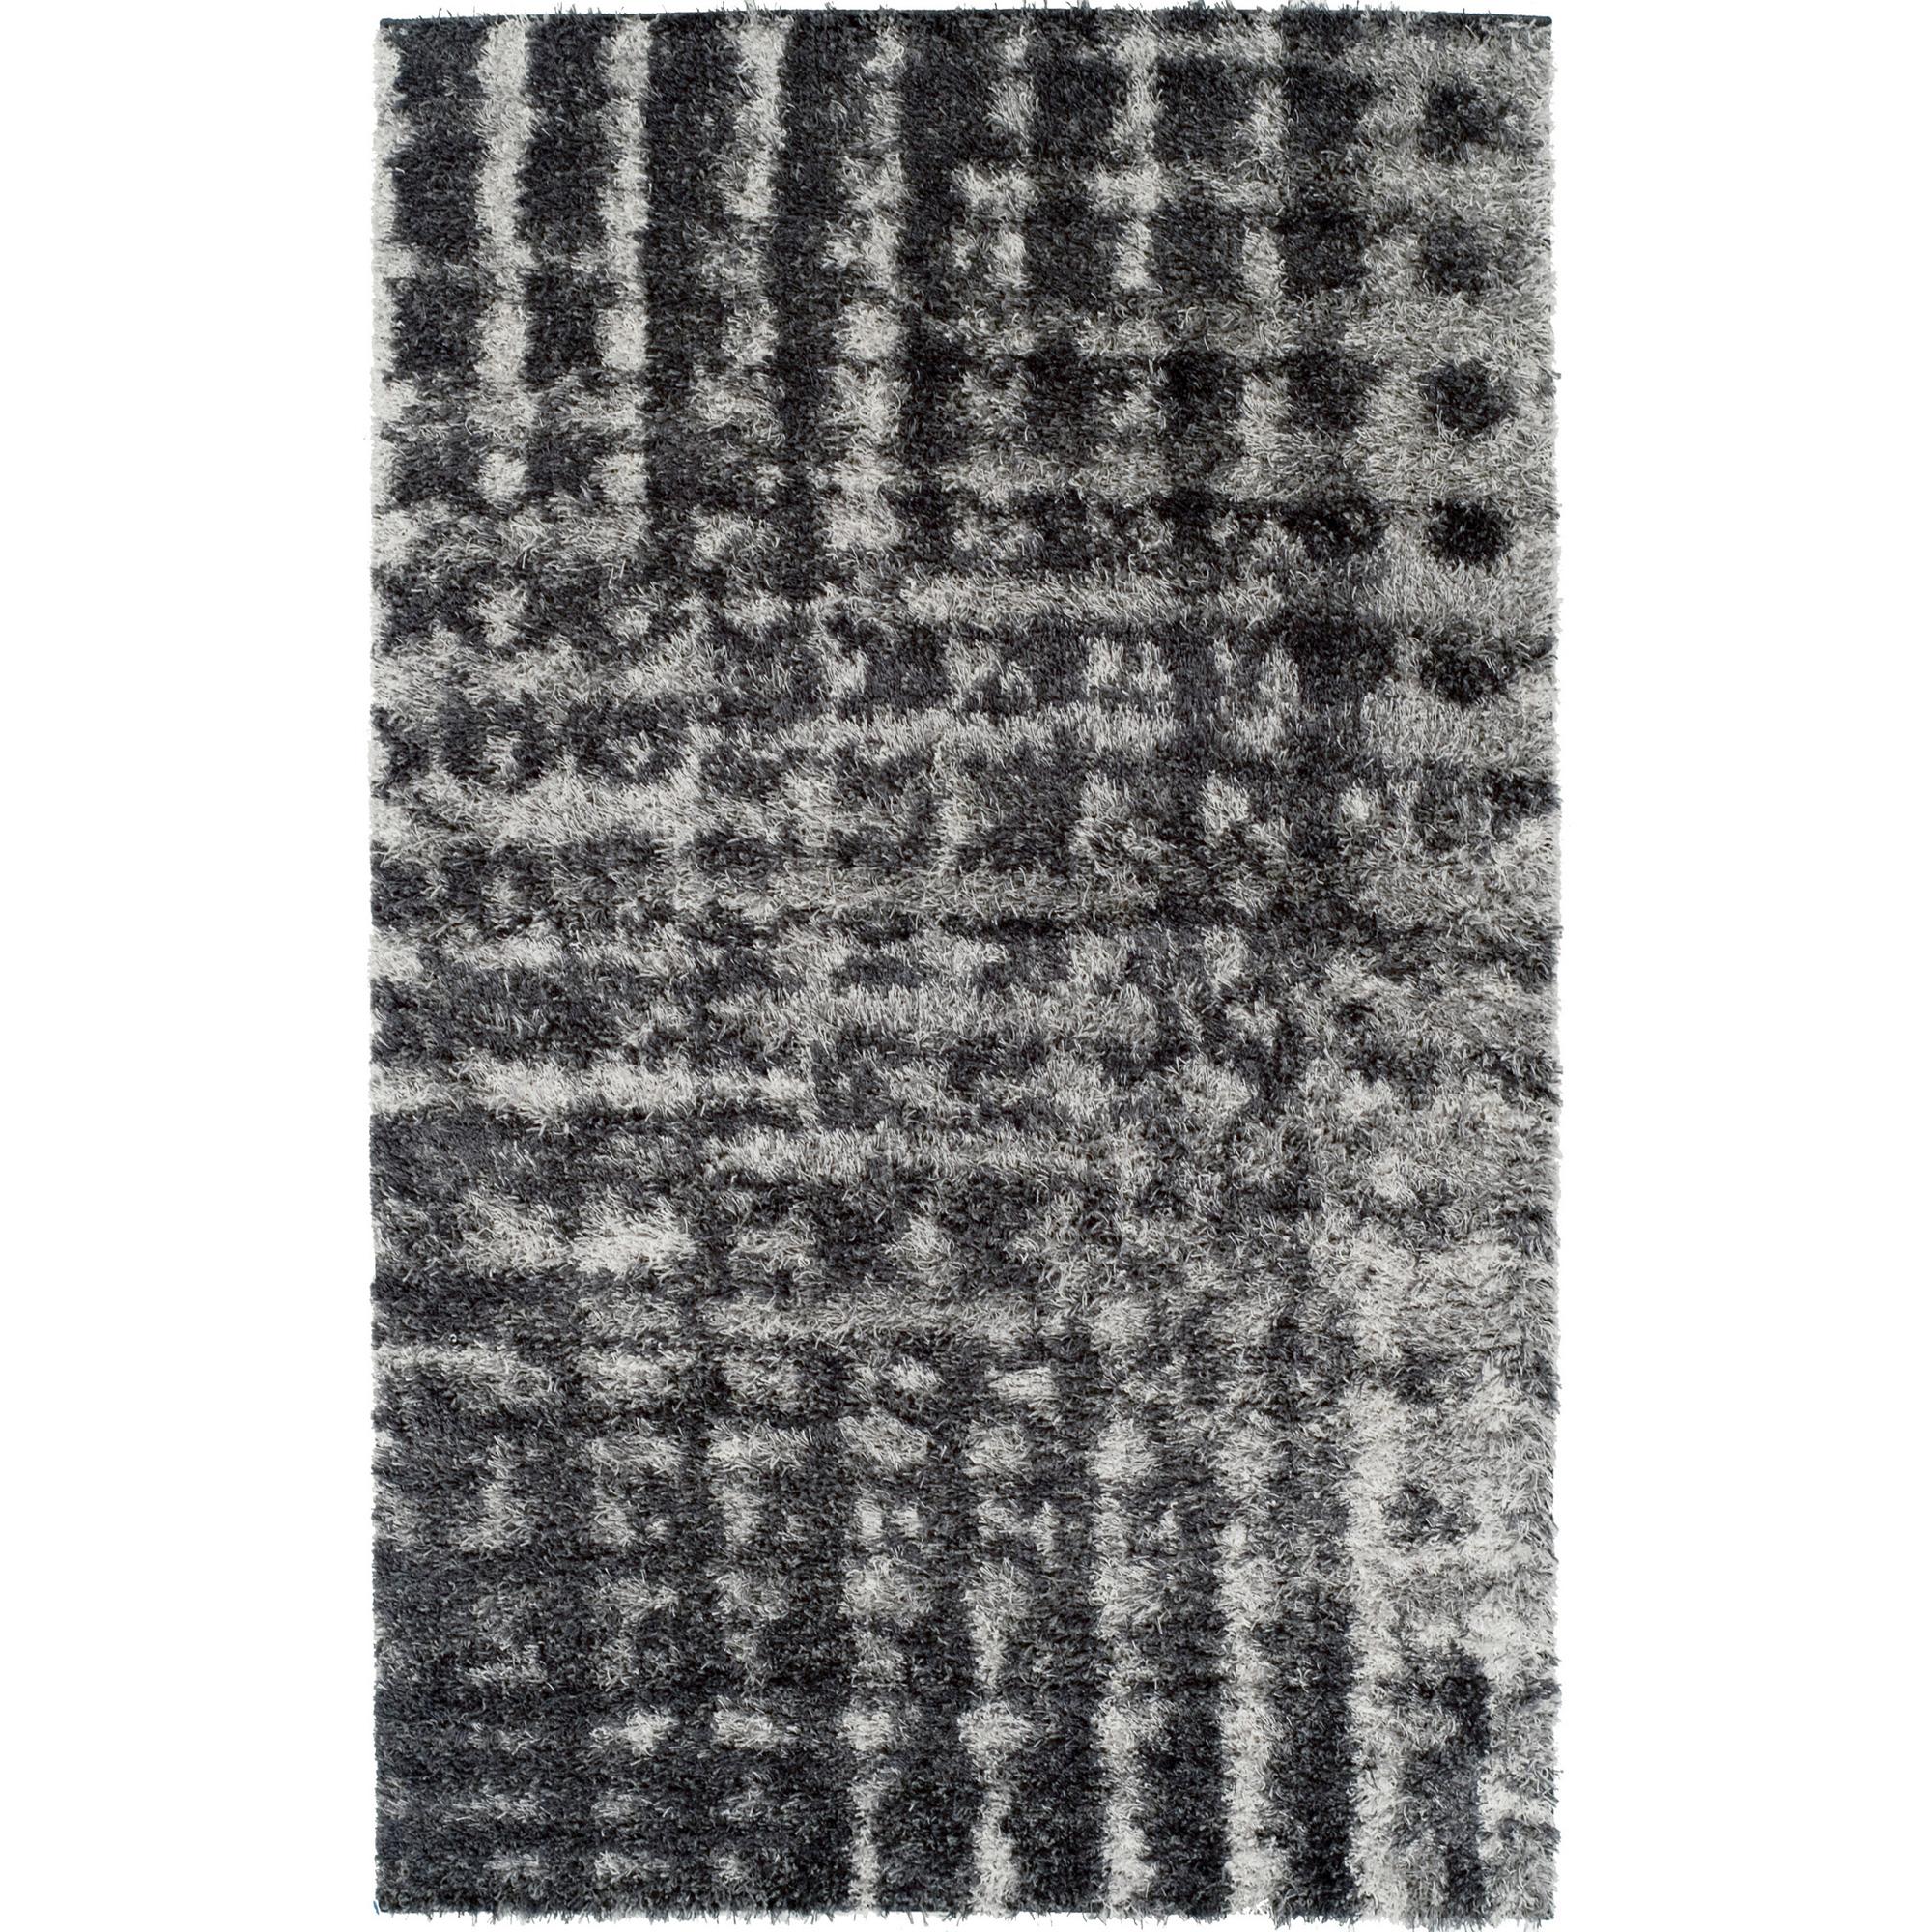 Dalyn Rug Company | Arturro Ash 5x8 Area Rug